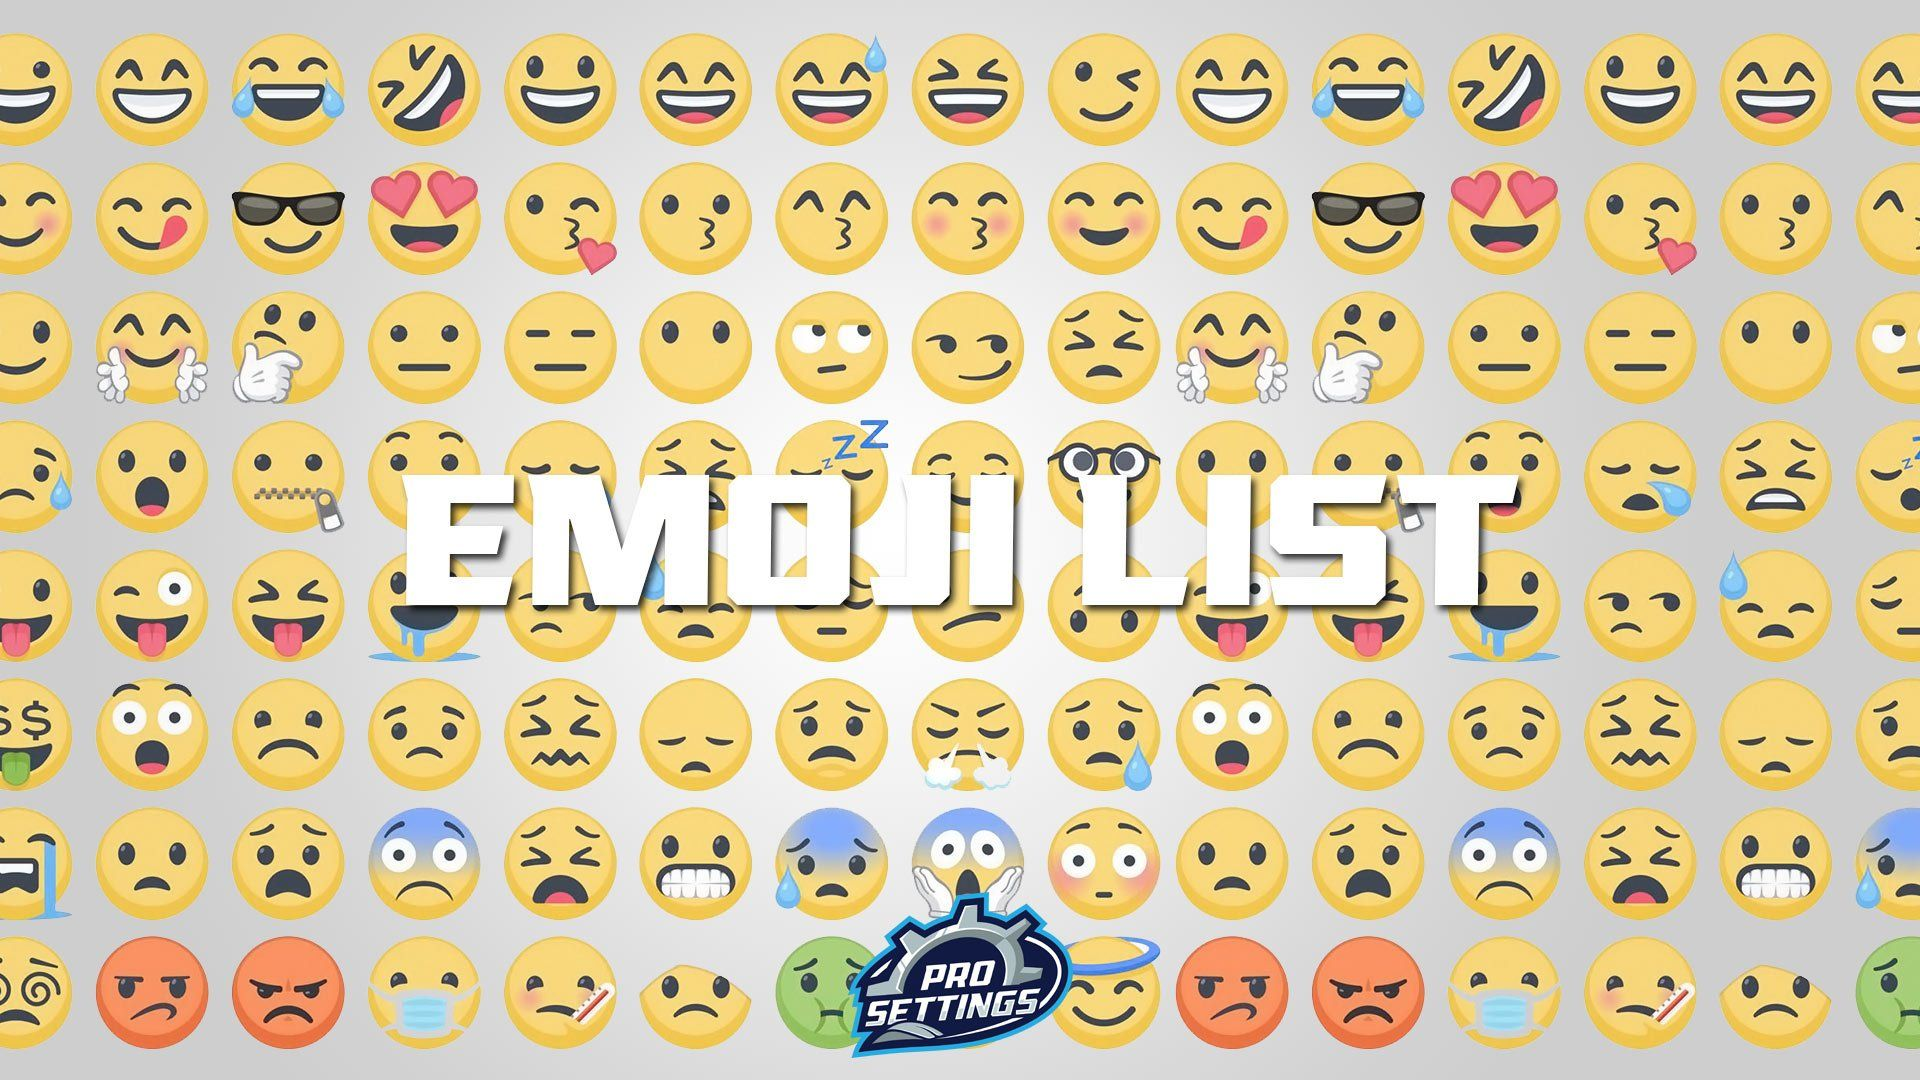 List of Emojis Emoji list, Emoji symbols, Emoji